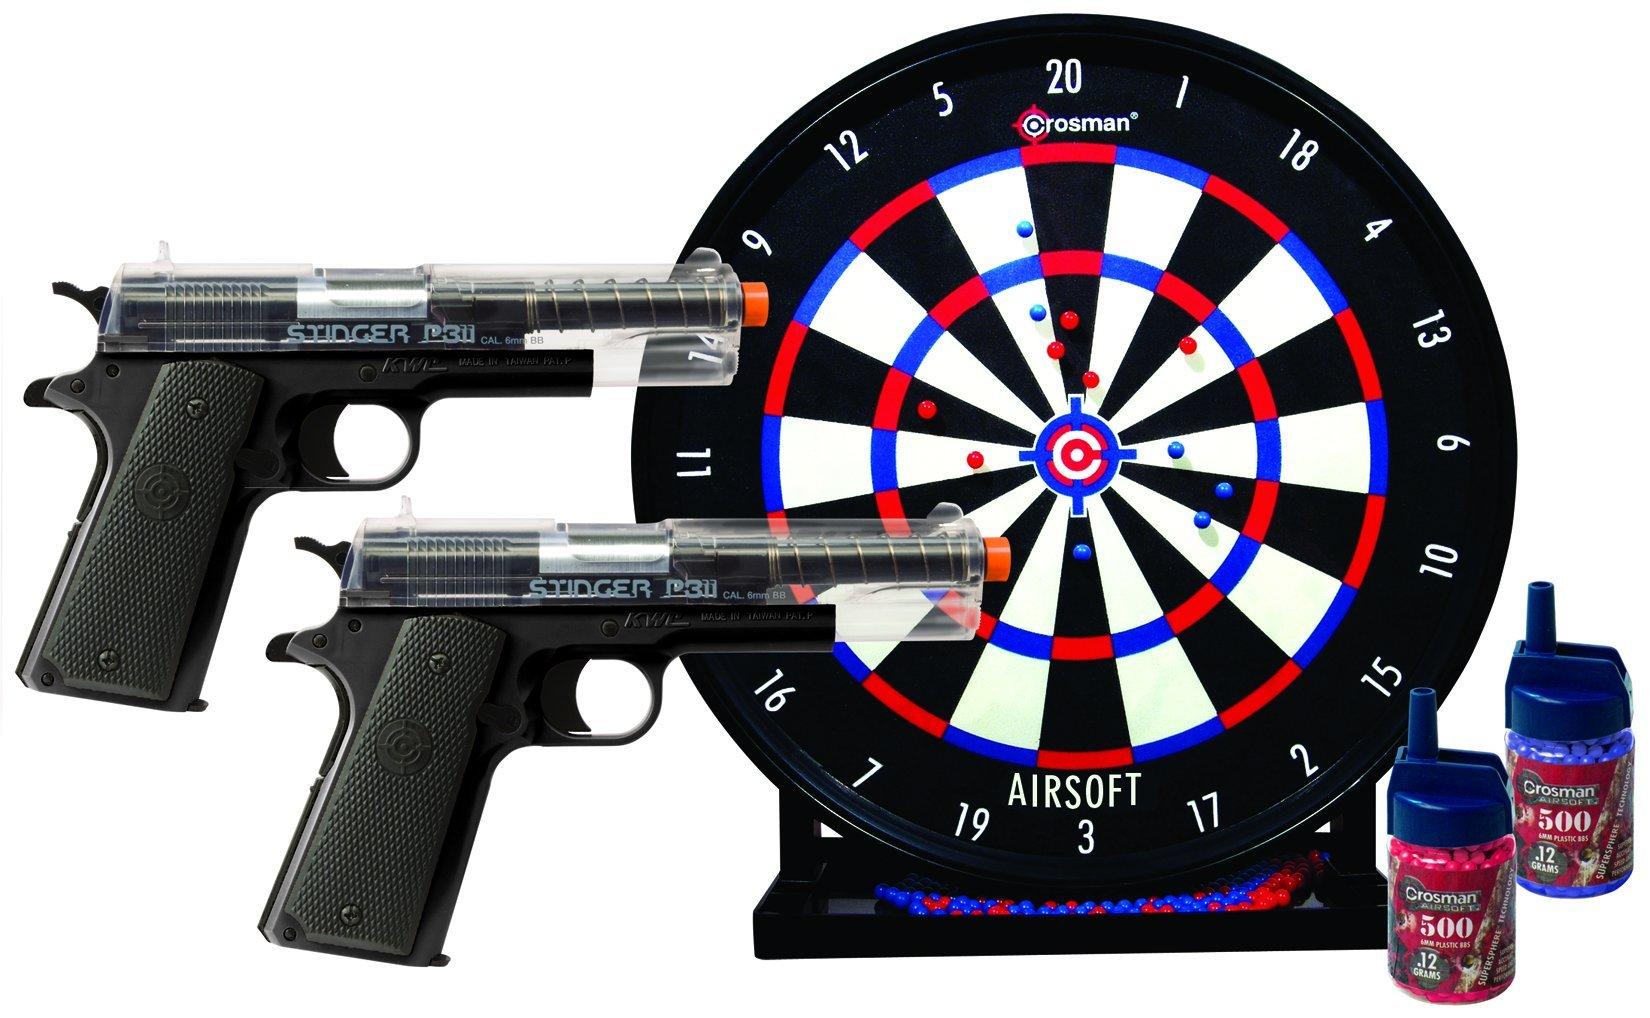 Crosman Airsoft Stinger Challenge Kit